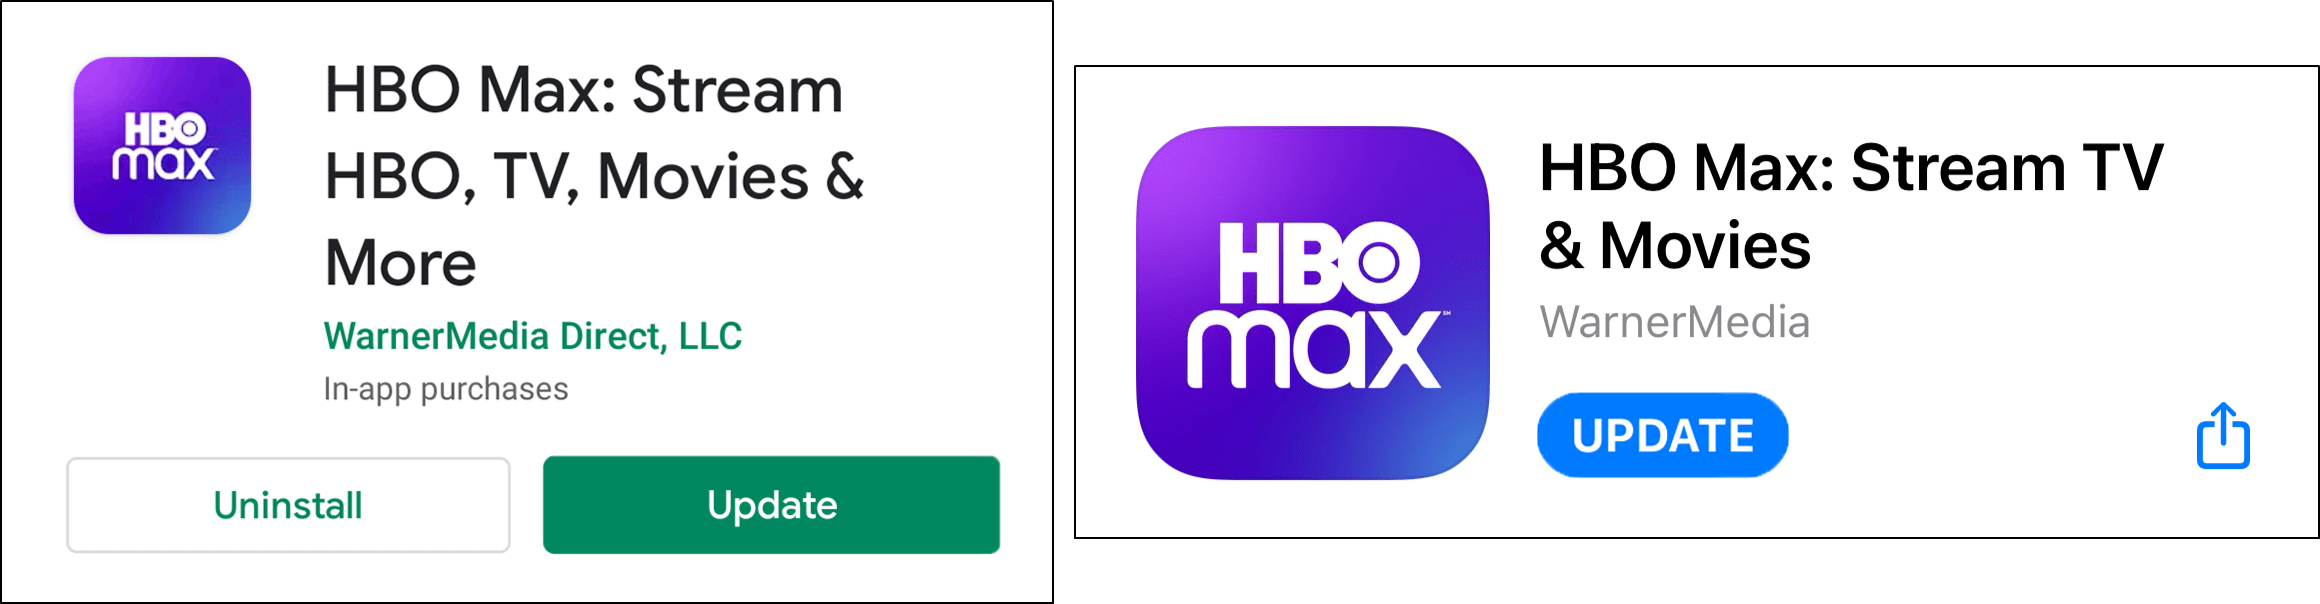 update hbo max to resolve error code 420